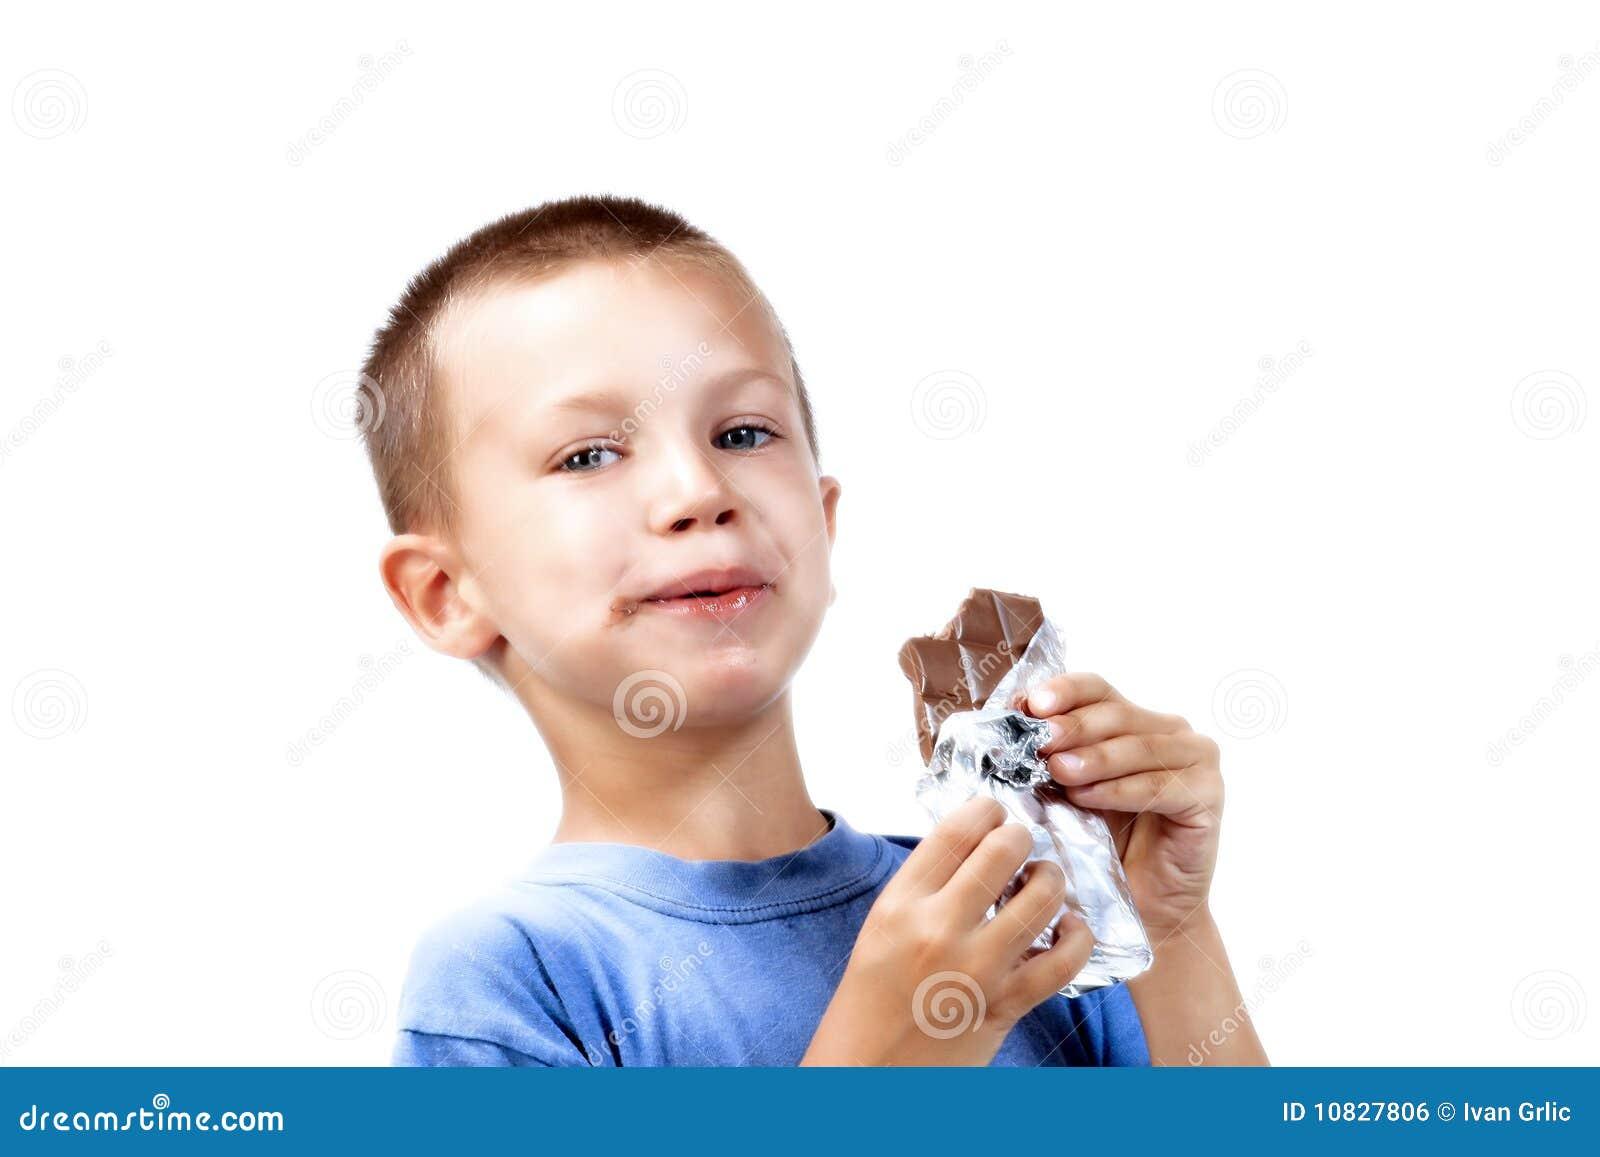 Eating Chocolate Royalty Free Stock Image - Image: 10827806